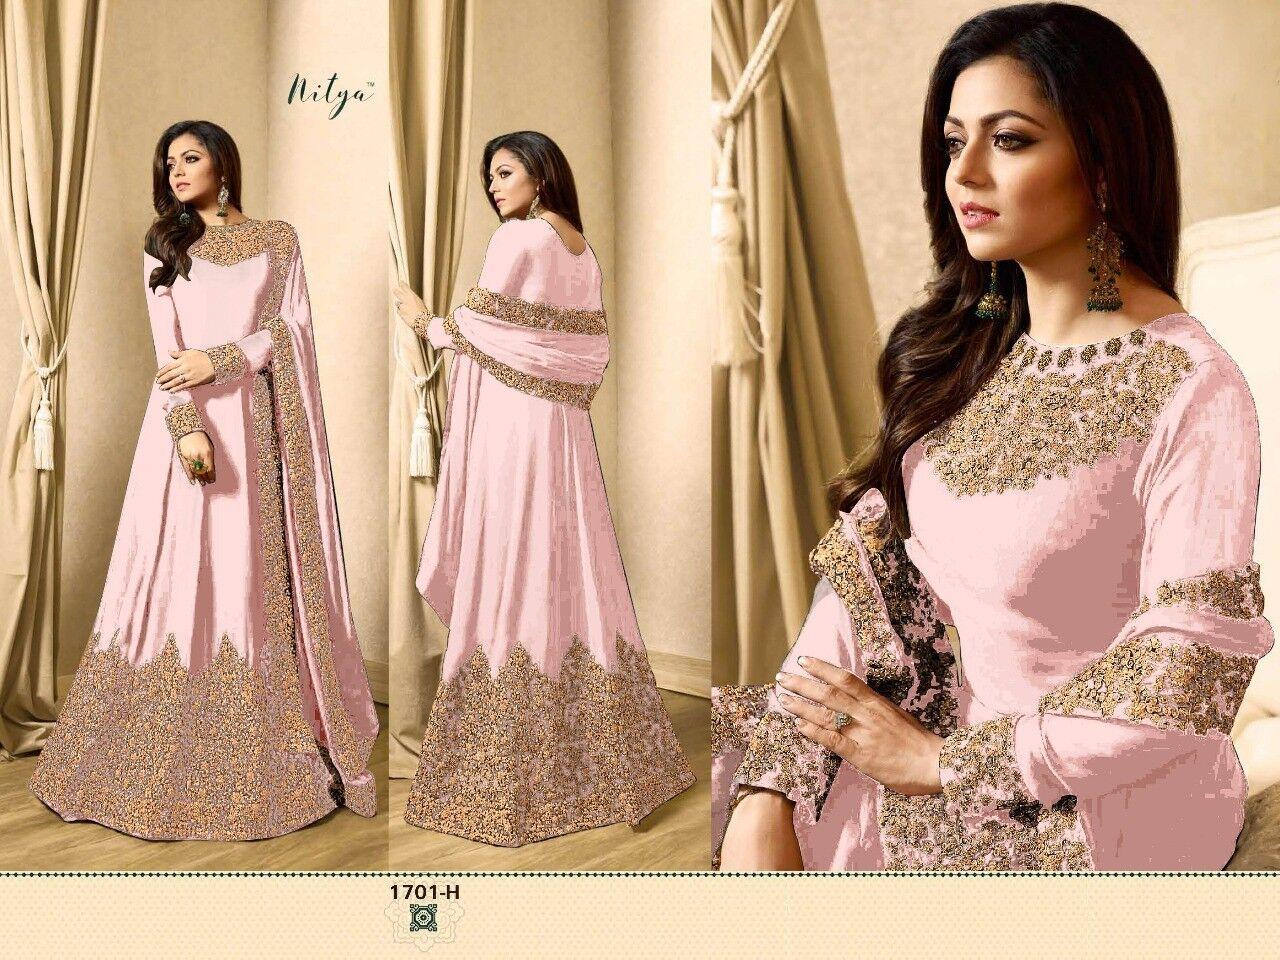 New Indian Designer Pakistani Anarkali Shalwar Suit Dress wedding Salwar Kameez